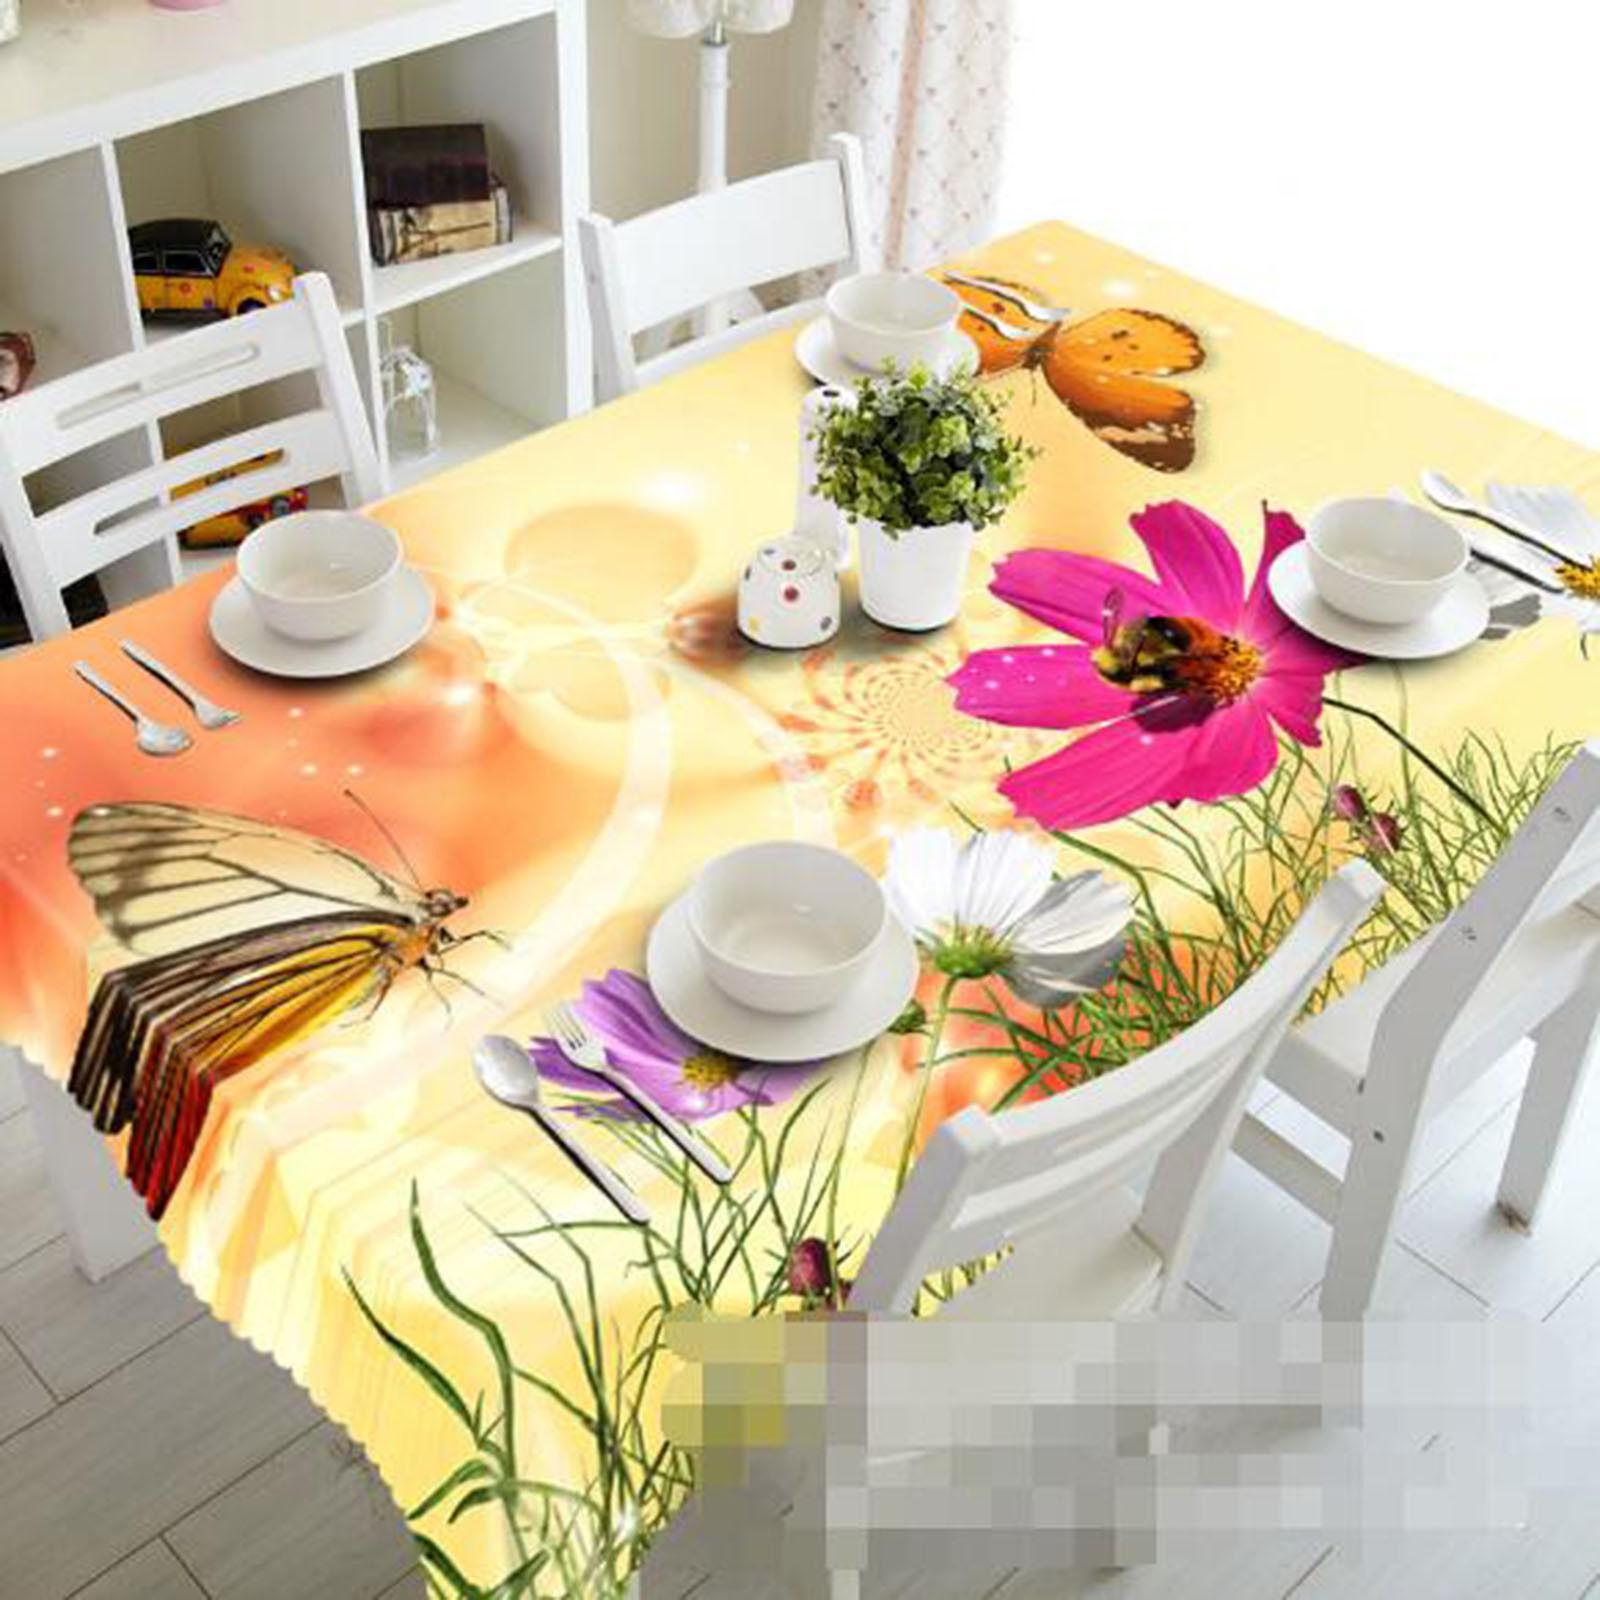 3D Blaume 552 Tischdecke Tischdecke Tuch Geburtstagsfeier AJ WALLPAPER DE Lemon